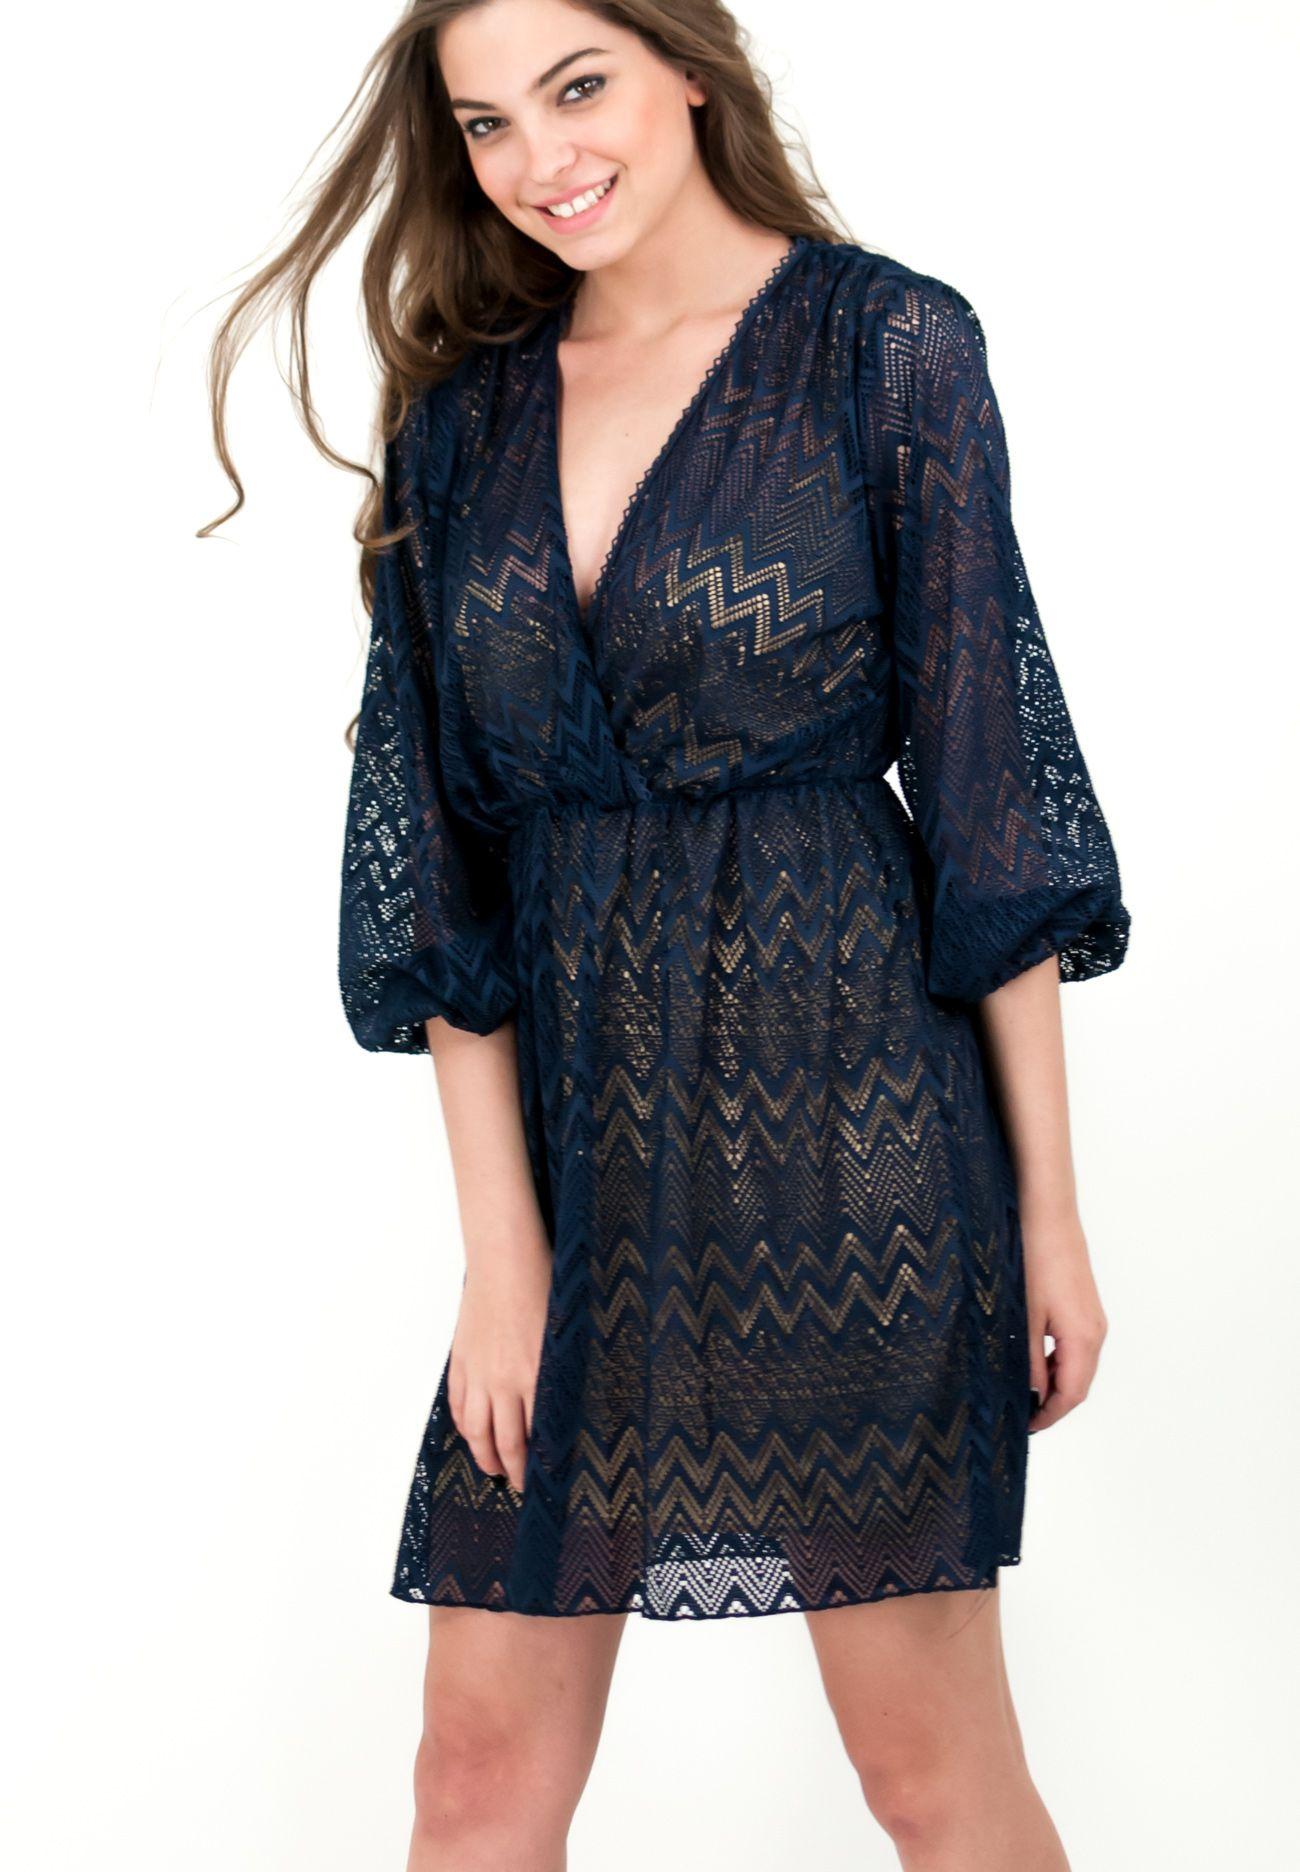 1f8960417414 Μίνι κρουαζέ δαντελένιο φόρεμα - ΦΟΡΕΜΑΤΑ - ΕΝΔΥΜΑΤΑ :: ZicZac ...